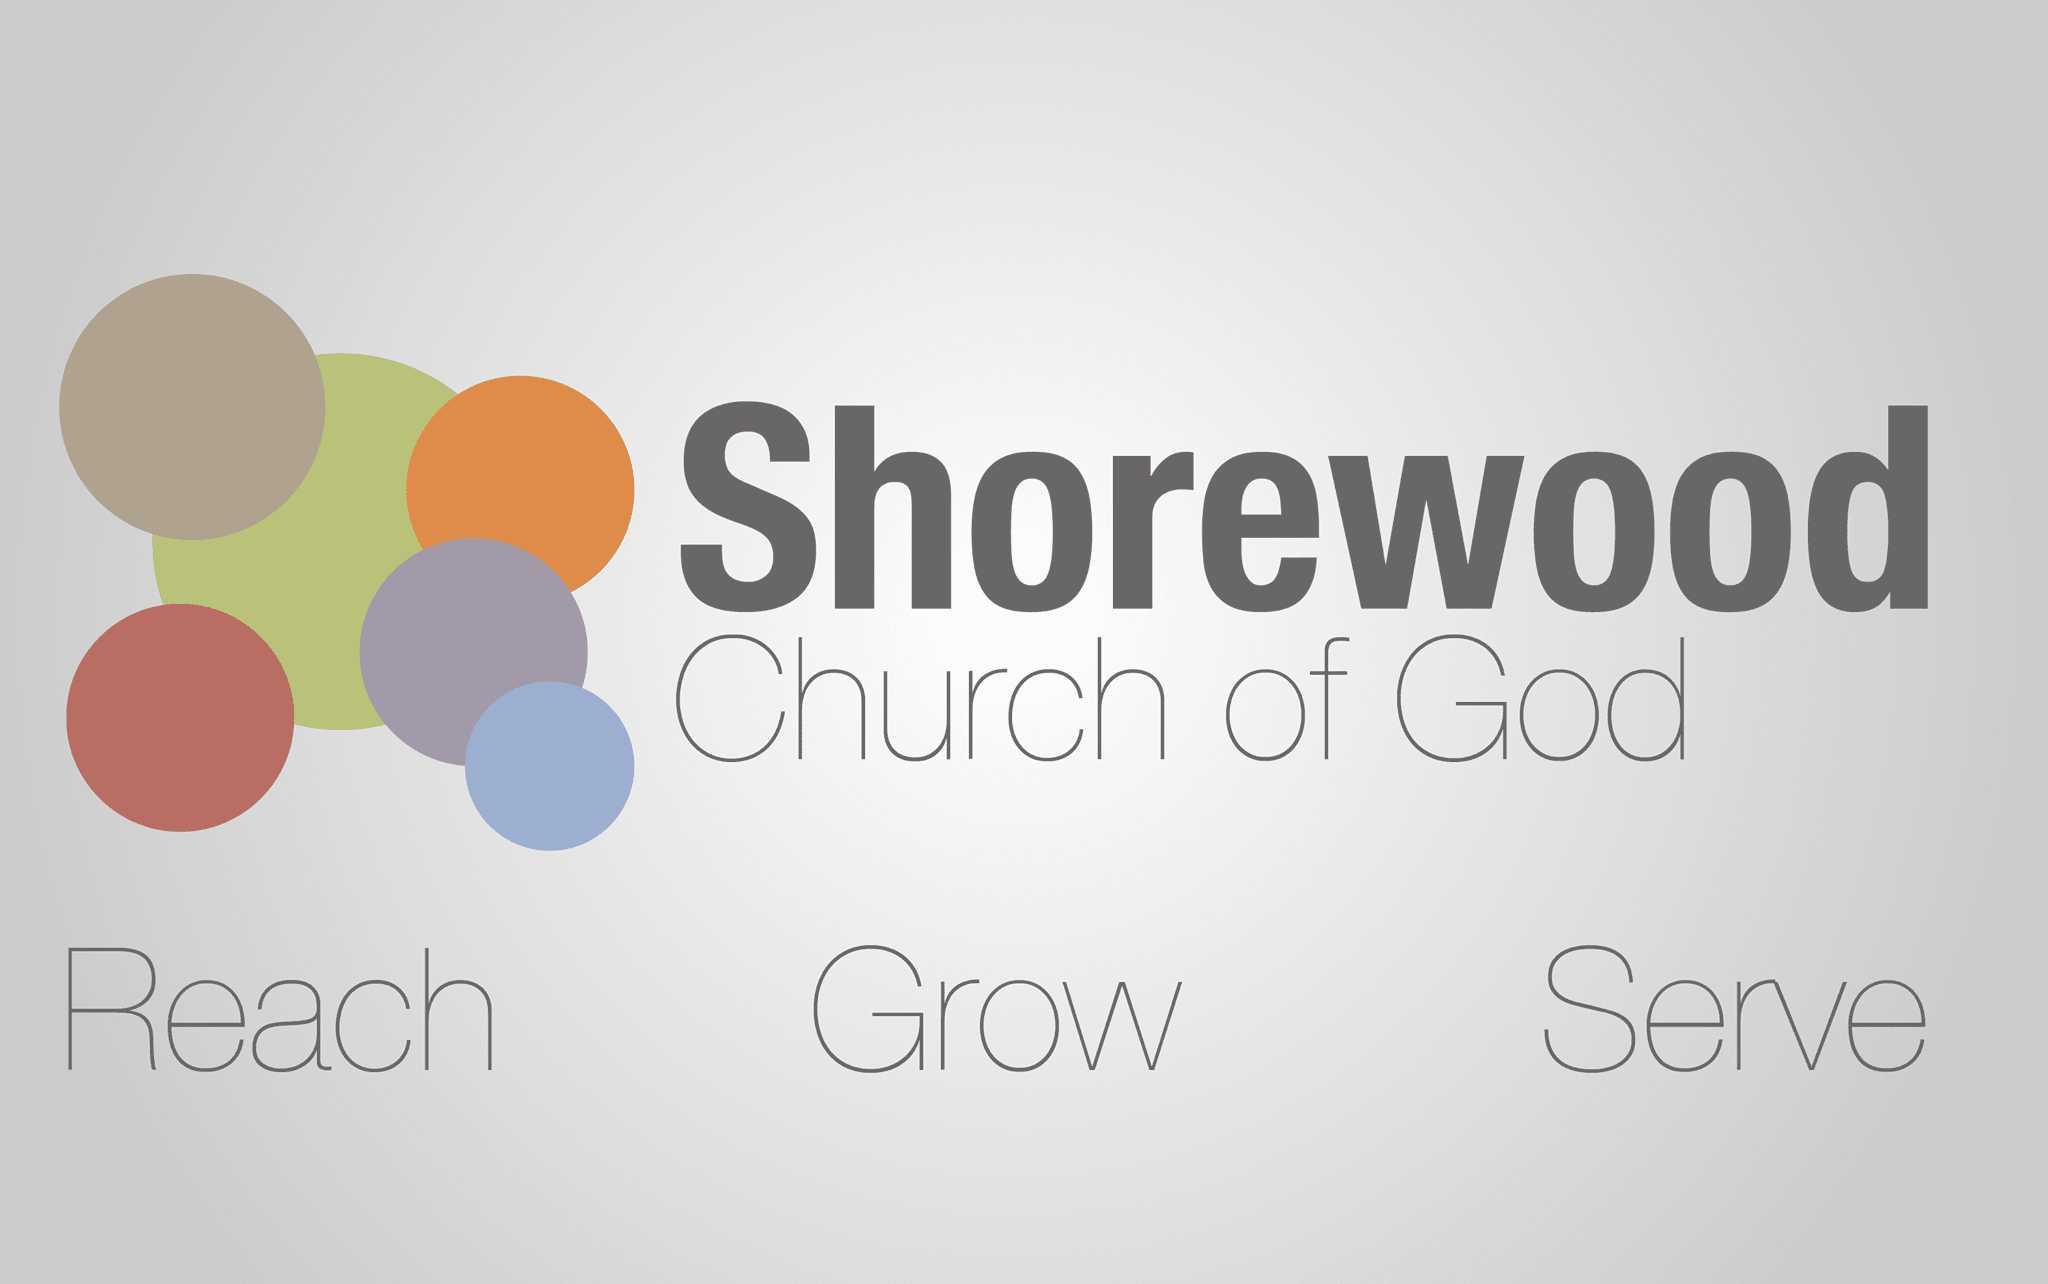 Shorewood Church of God Hope Box